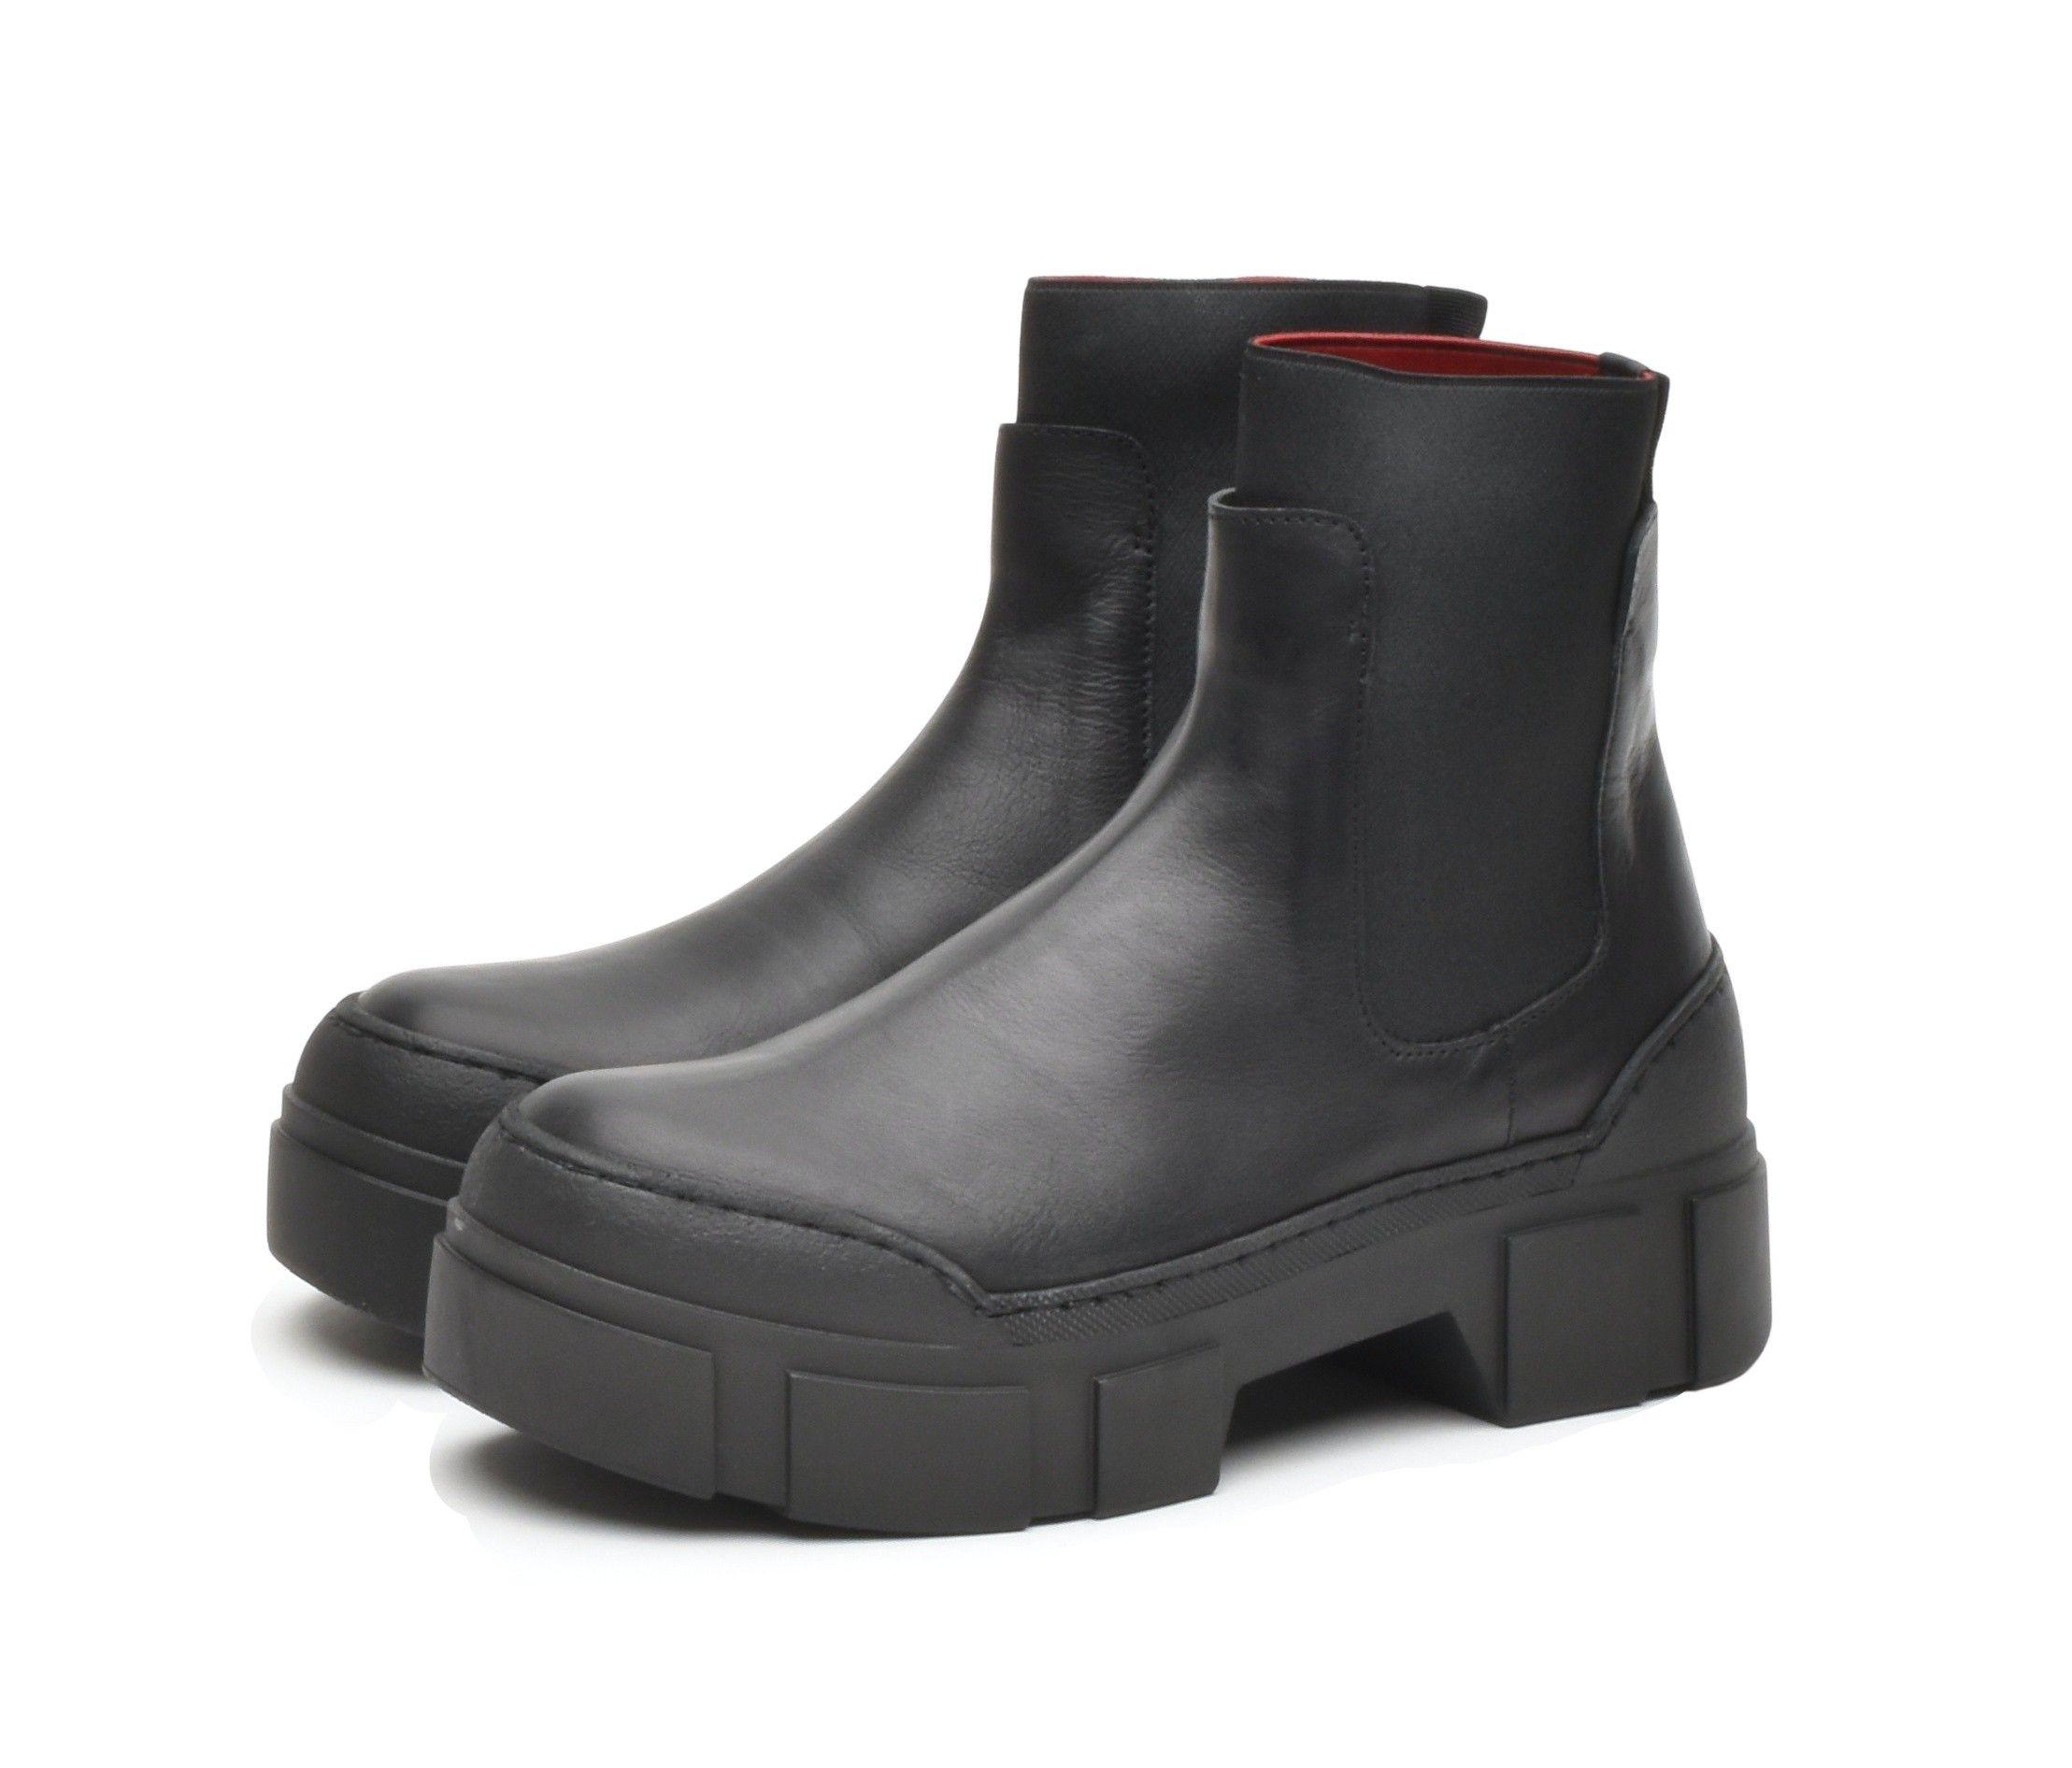 VIC MATIÉ - Damen Schuhe - Tronchetto Santos Elastico - Schwarz